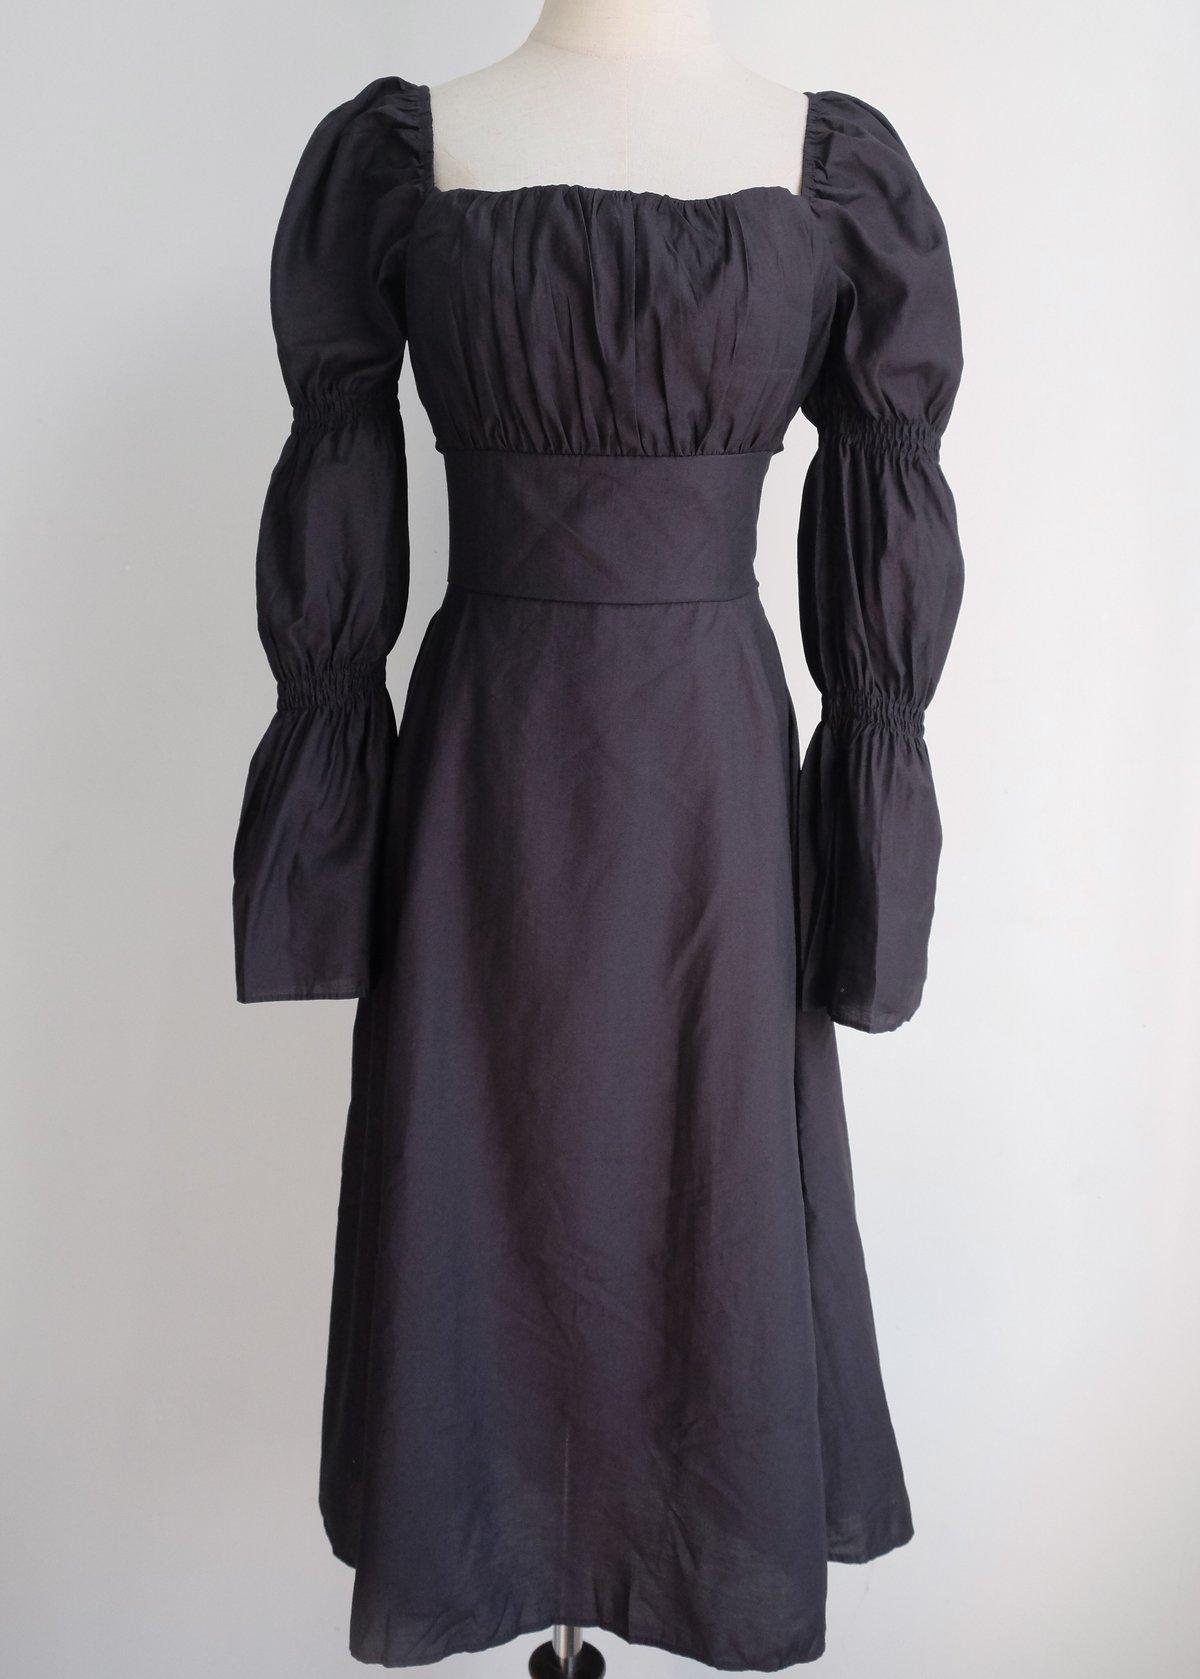 Image of  SAMPLE SALE - Unreleased Dress 28